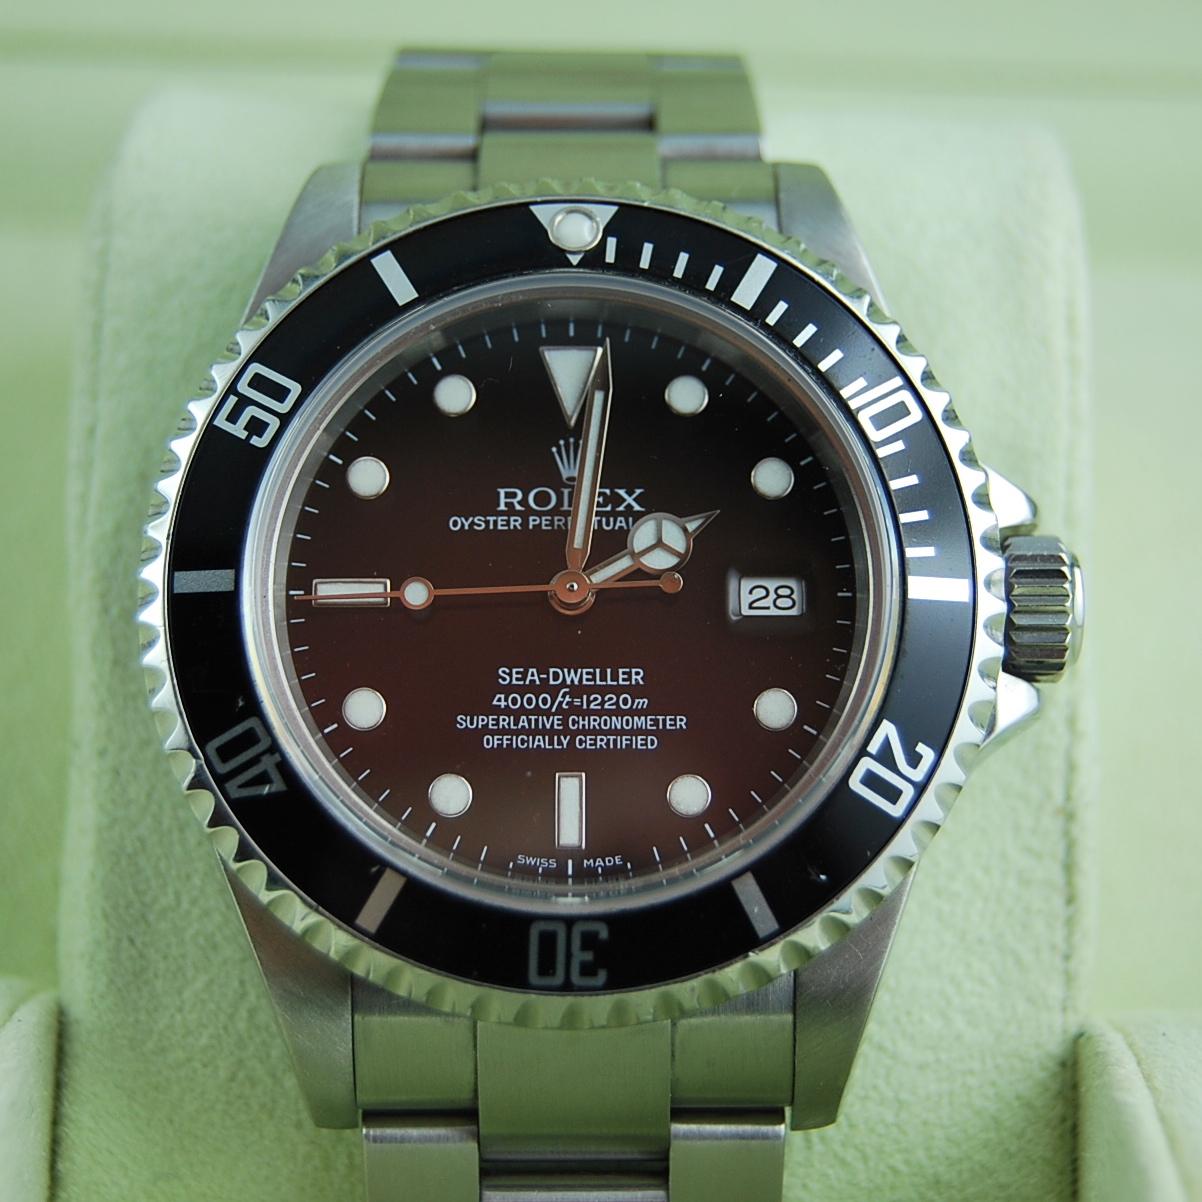 Rolex Sea-Dweller 16600   Trento